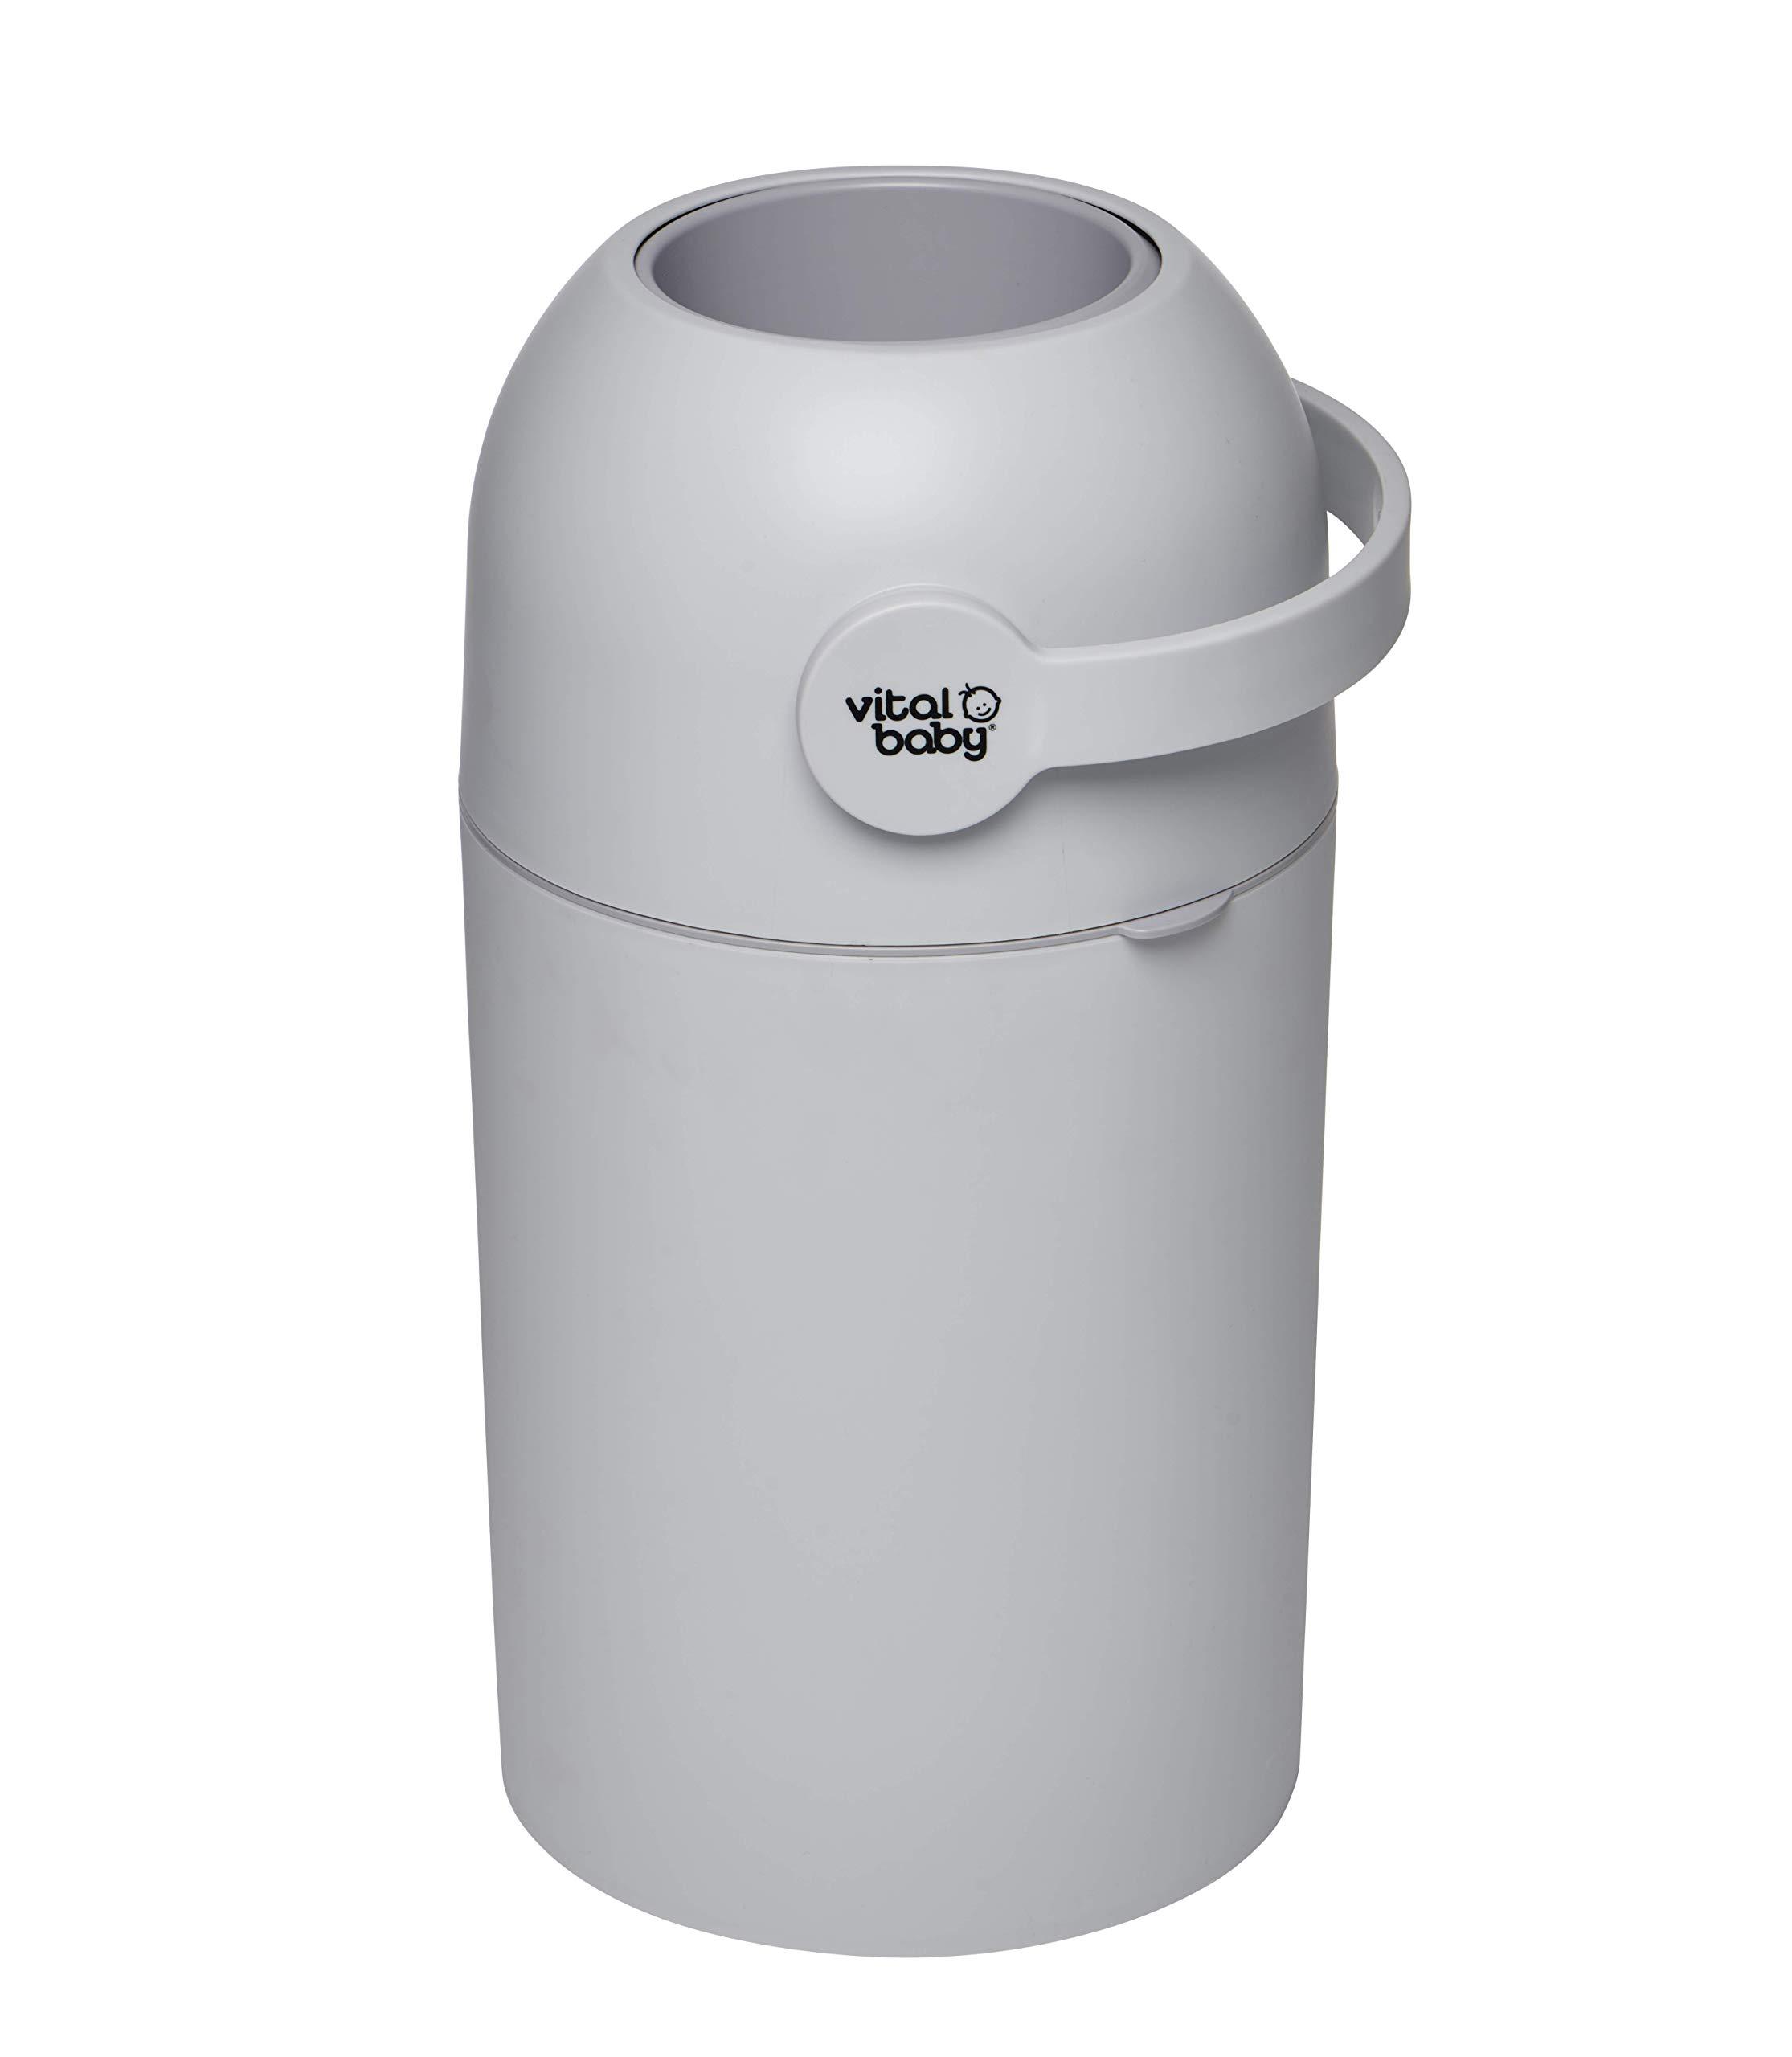 vital baby HYGIENE Odour-Trap Nappy Disposal System by vital baby HYGIENE